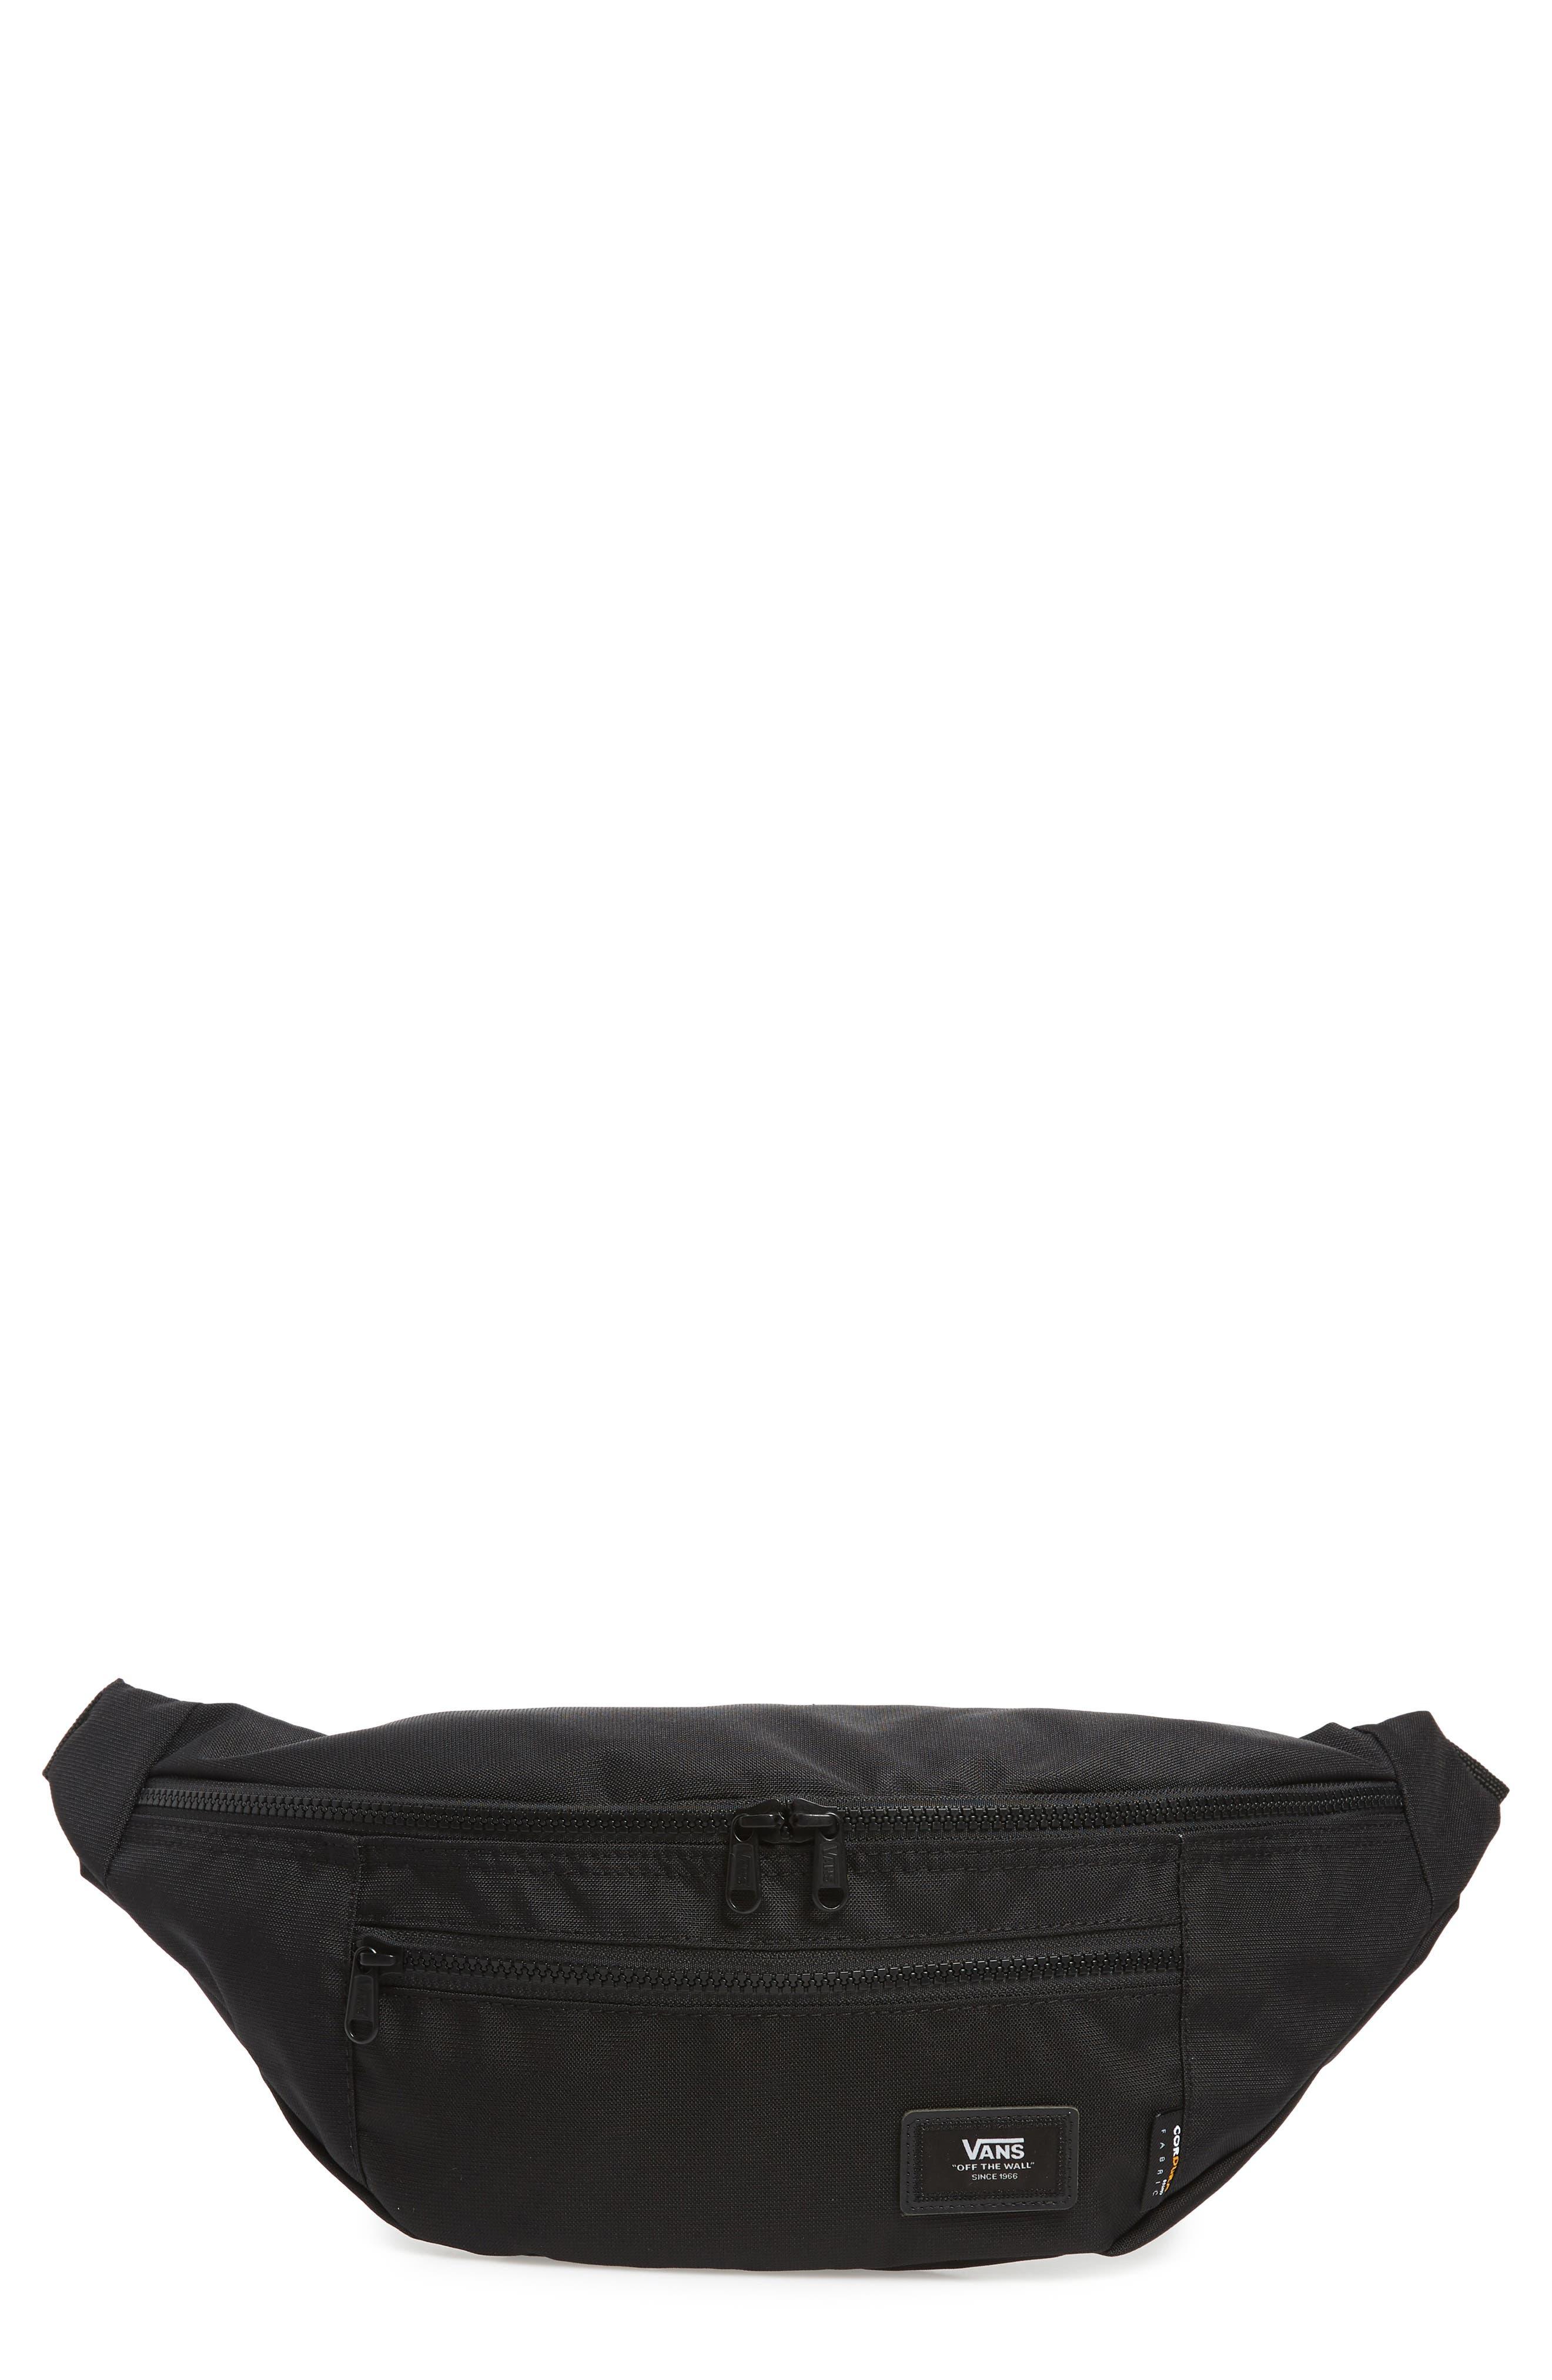 Ward Water Repellent Waist Pack, Main, color, BLACK